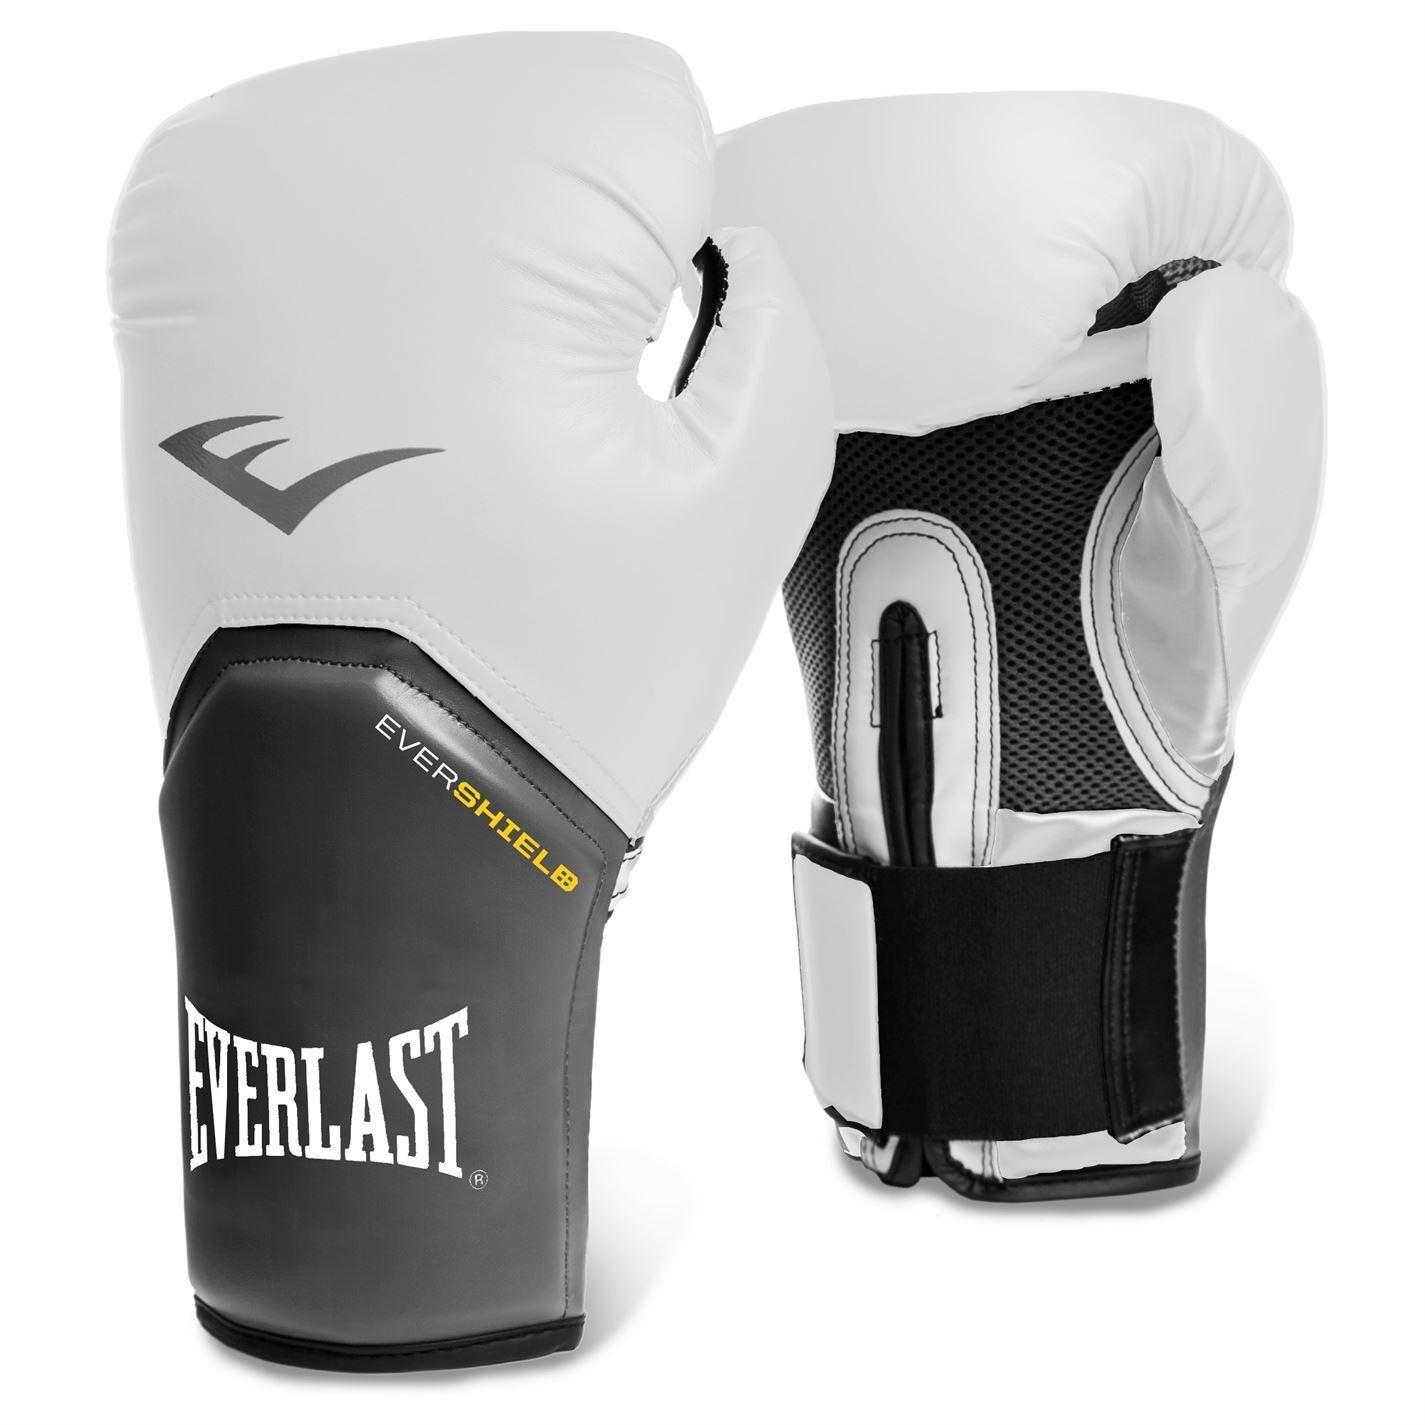 Everlast Elite scatolae Formazione Guanti BiancoGrigio MMA MUAI THAI Palestra Fitness